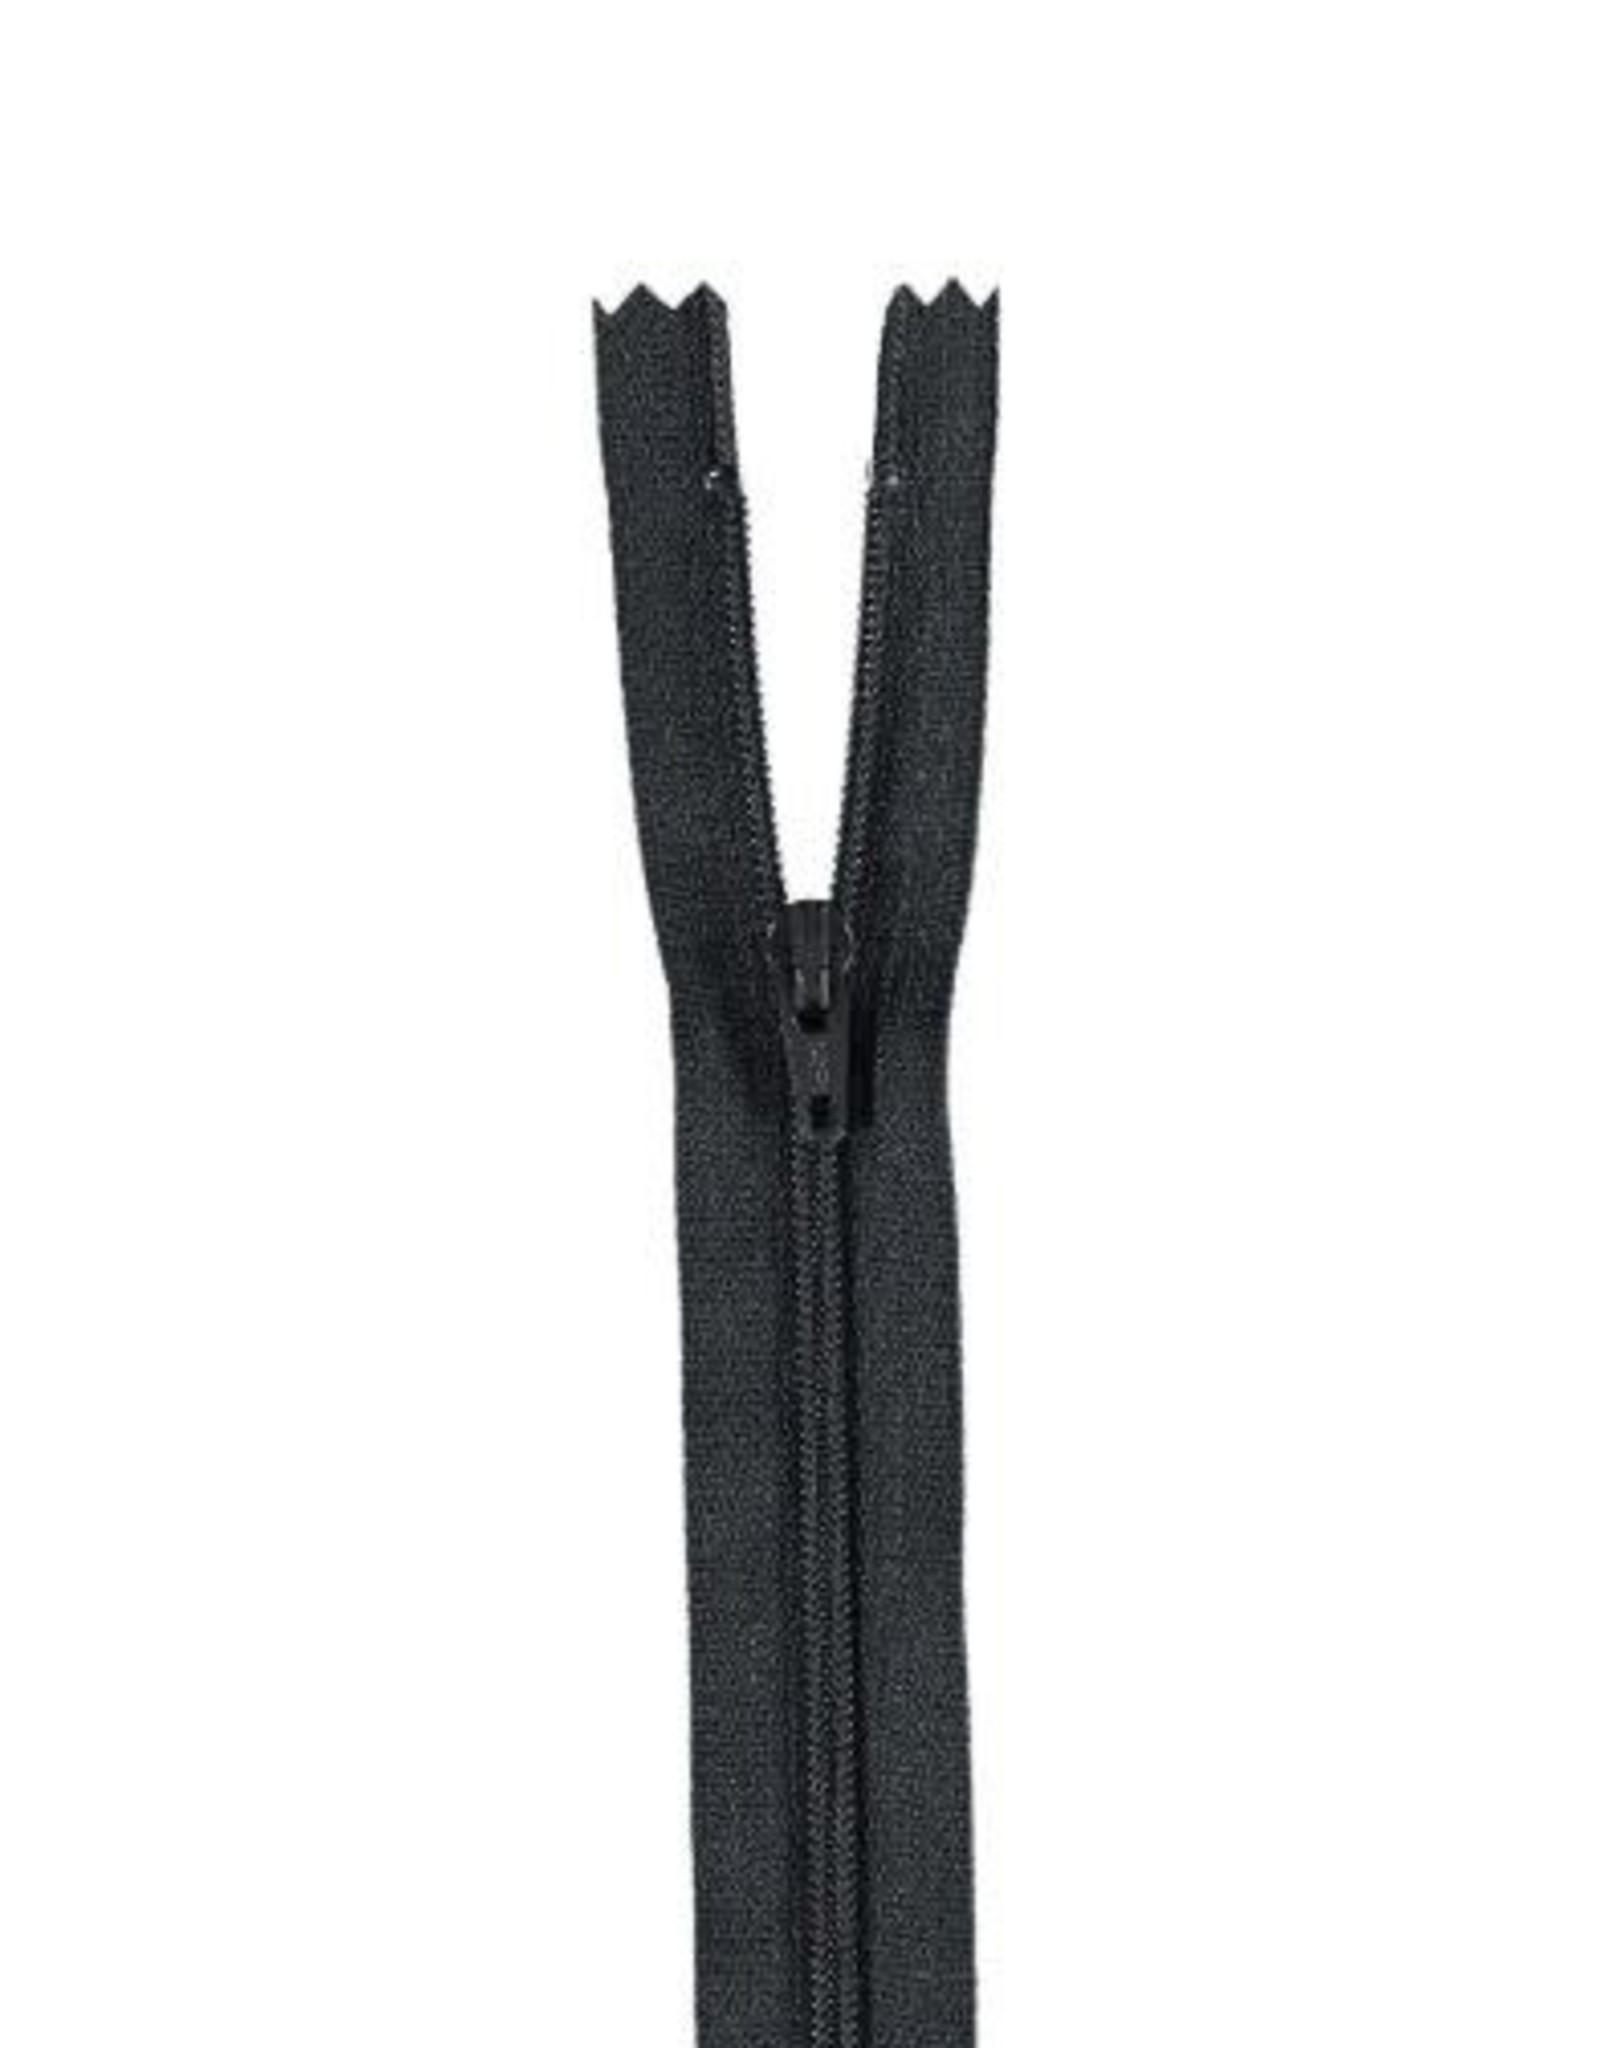 YKK Spiraalrits niet-DB 3mm antraciet 156-30cm